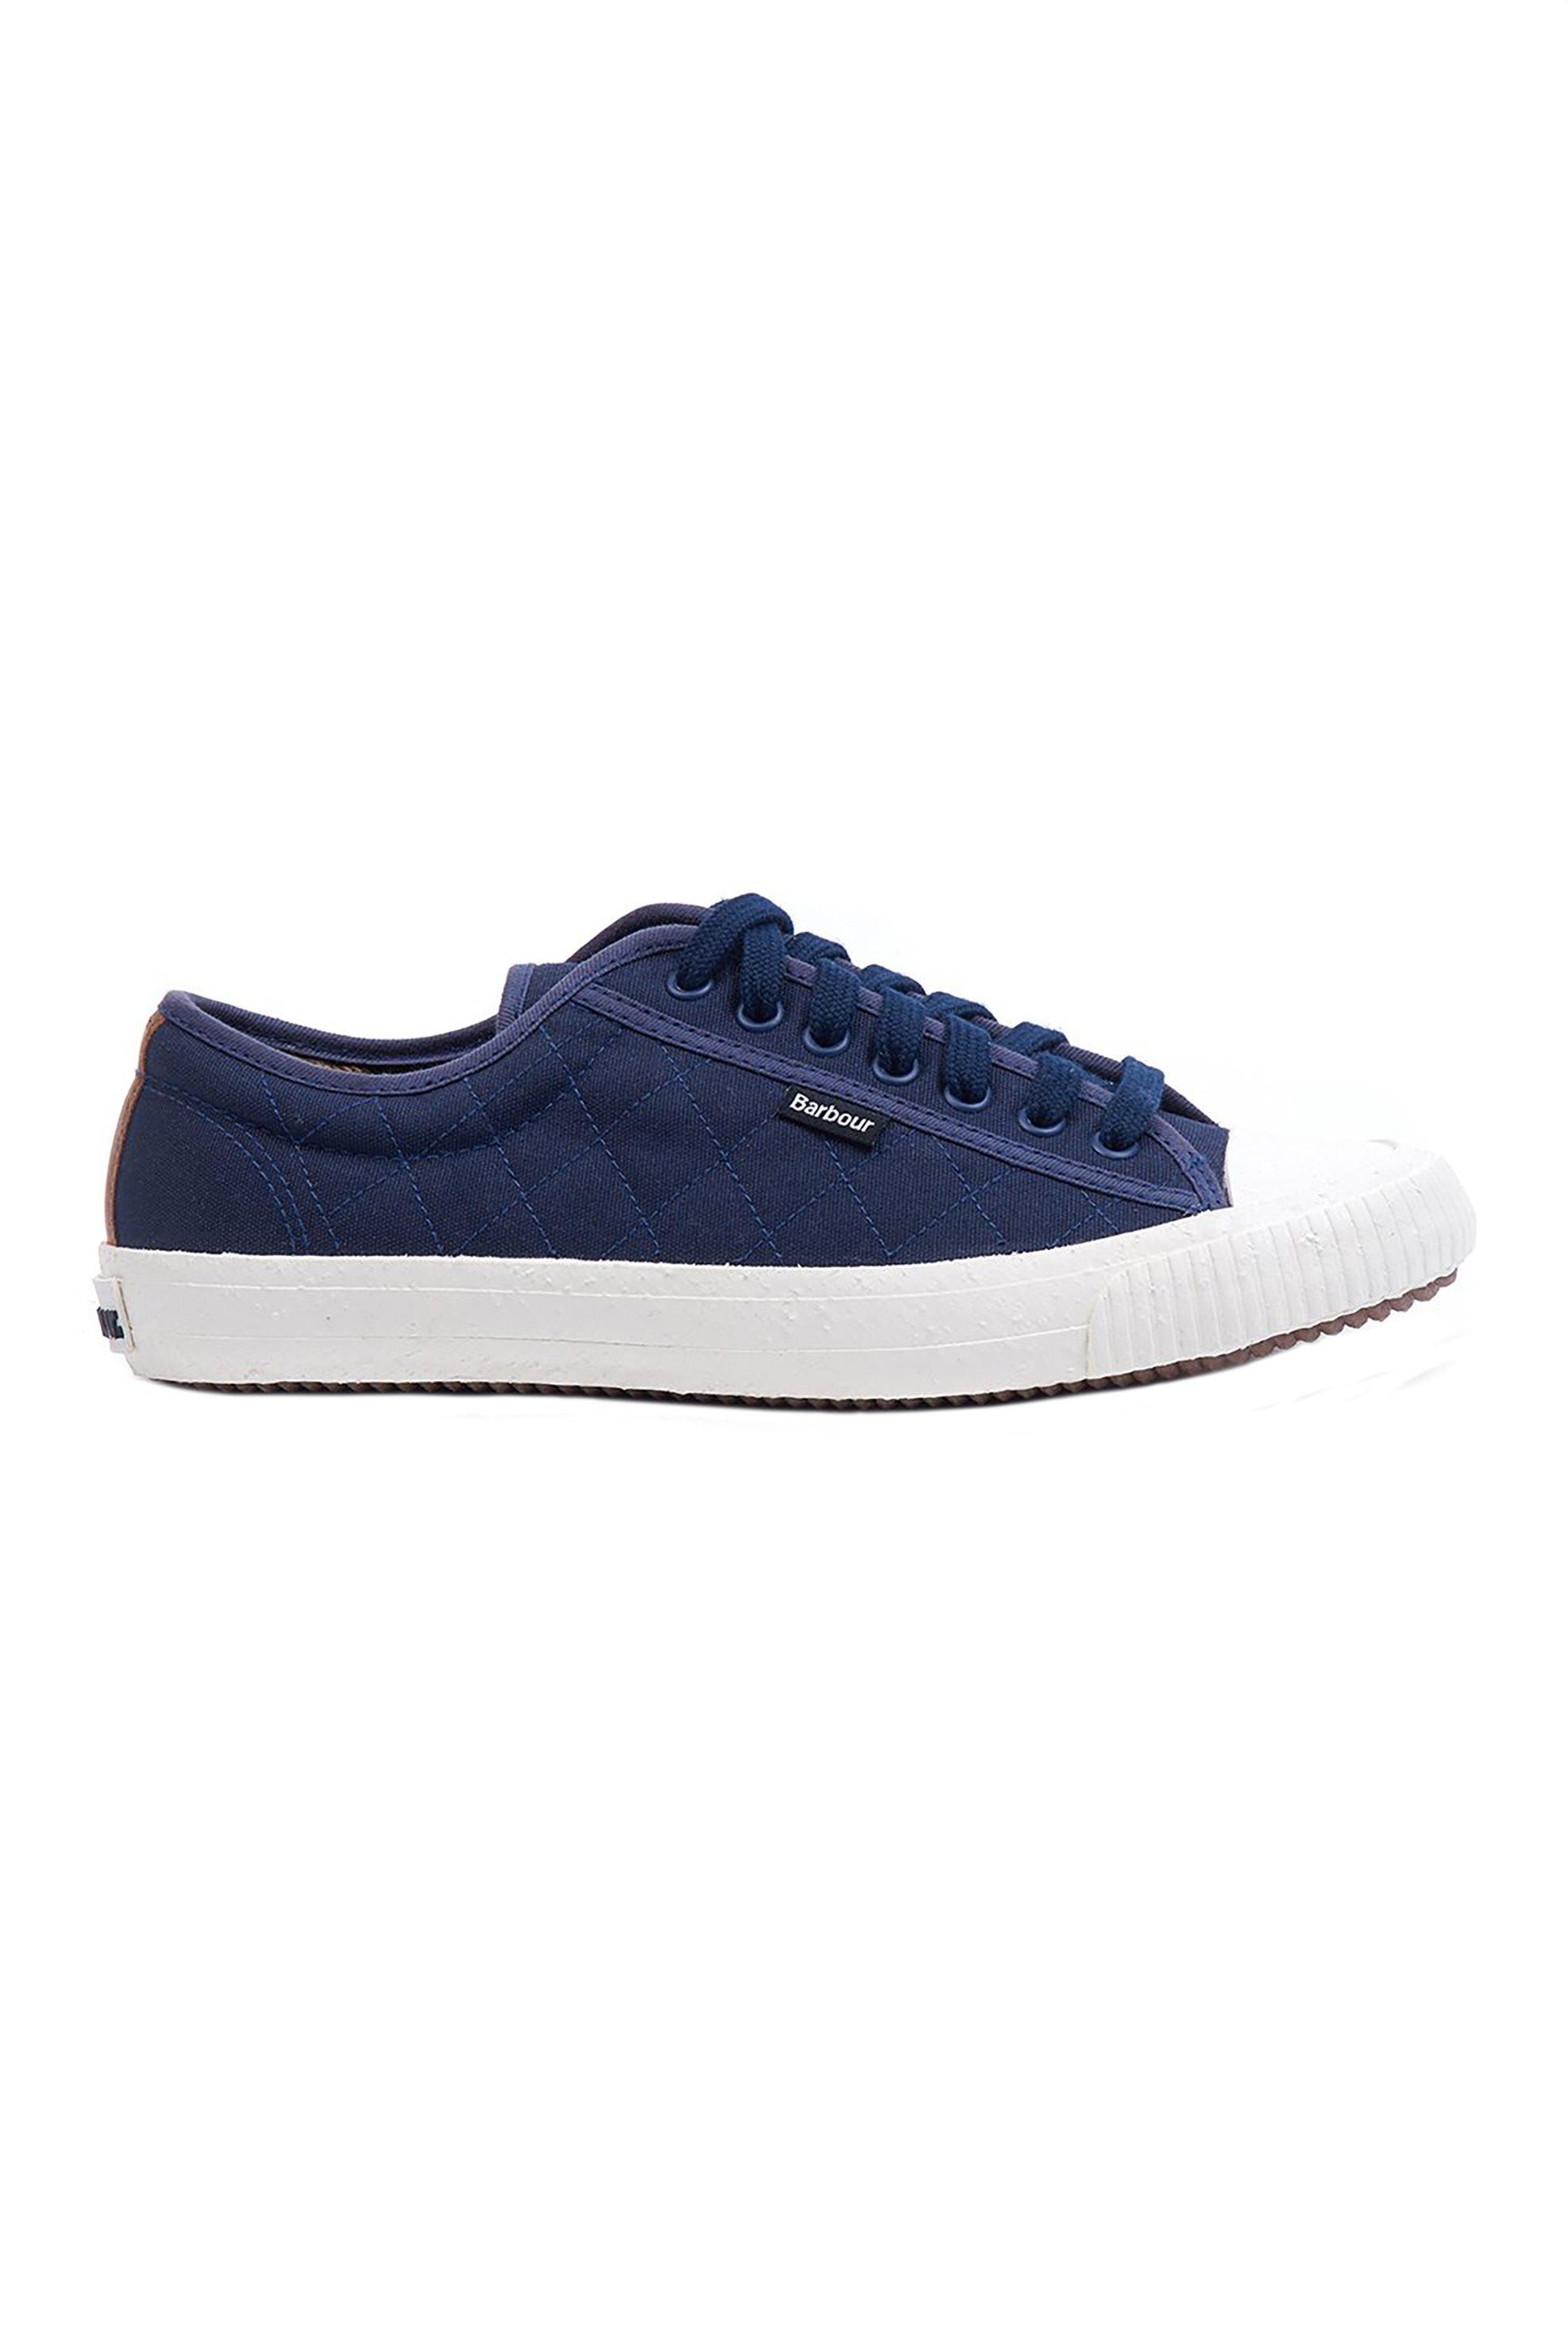 "Barbour ανδρικά sneakers καπιτονέ ""Centurion"" – MFO0480 – Μπλε Σκούρο"